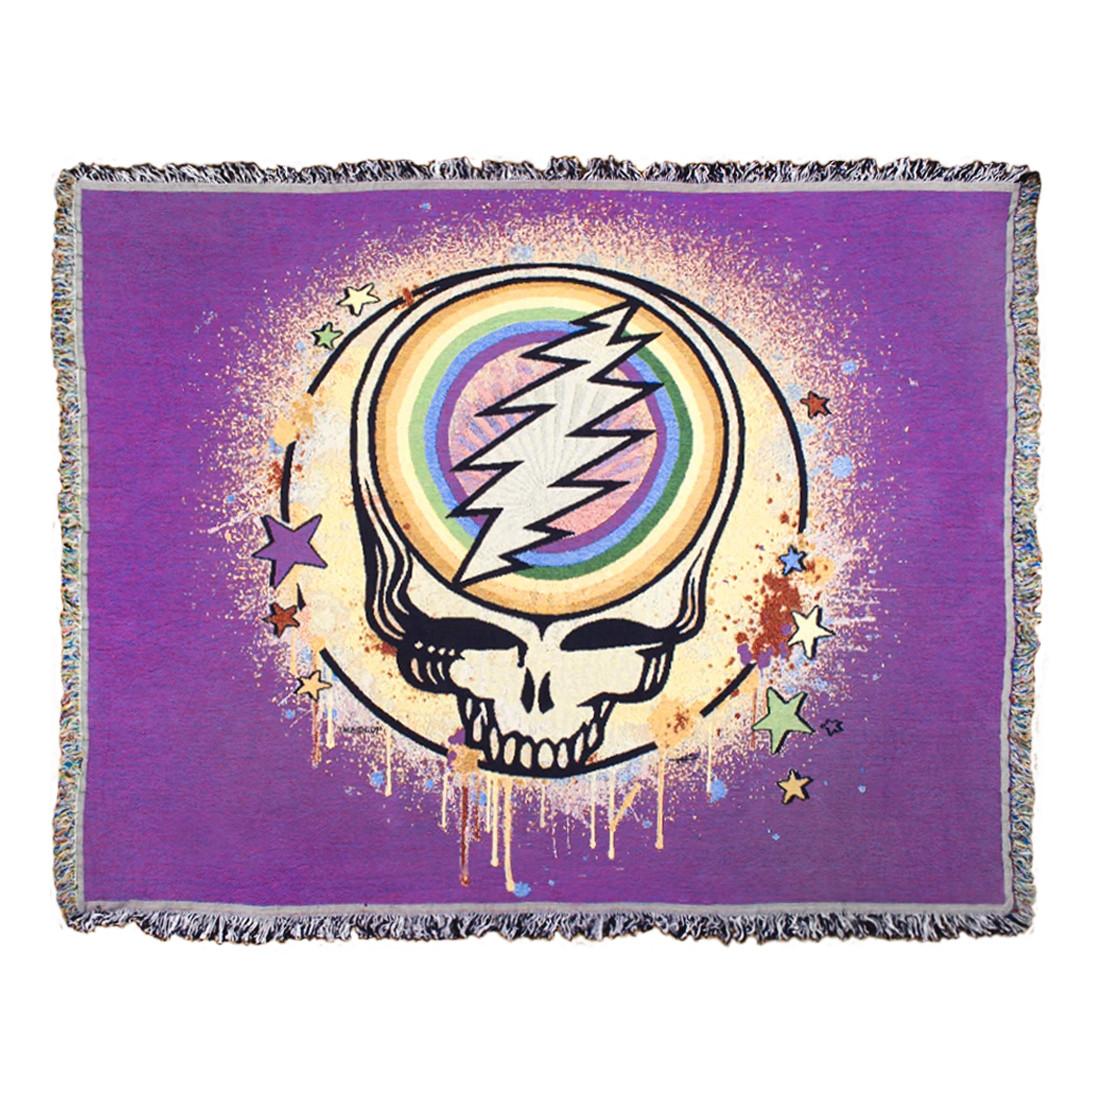 GD Rainbow Splatter Purple Woven Blanket